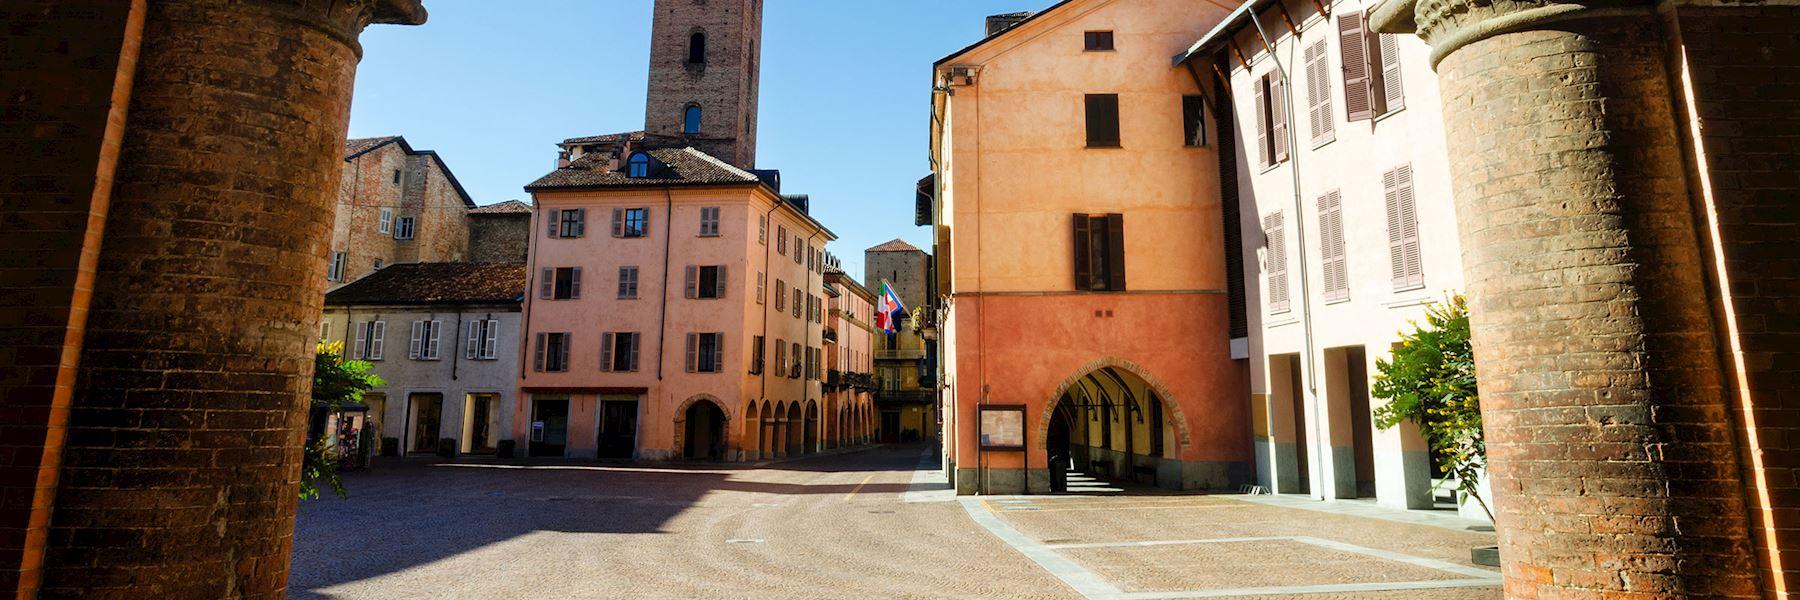 Visit Alba, Italy